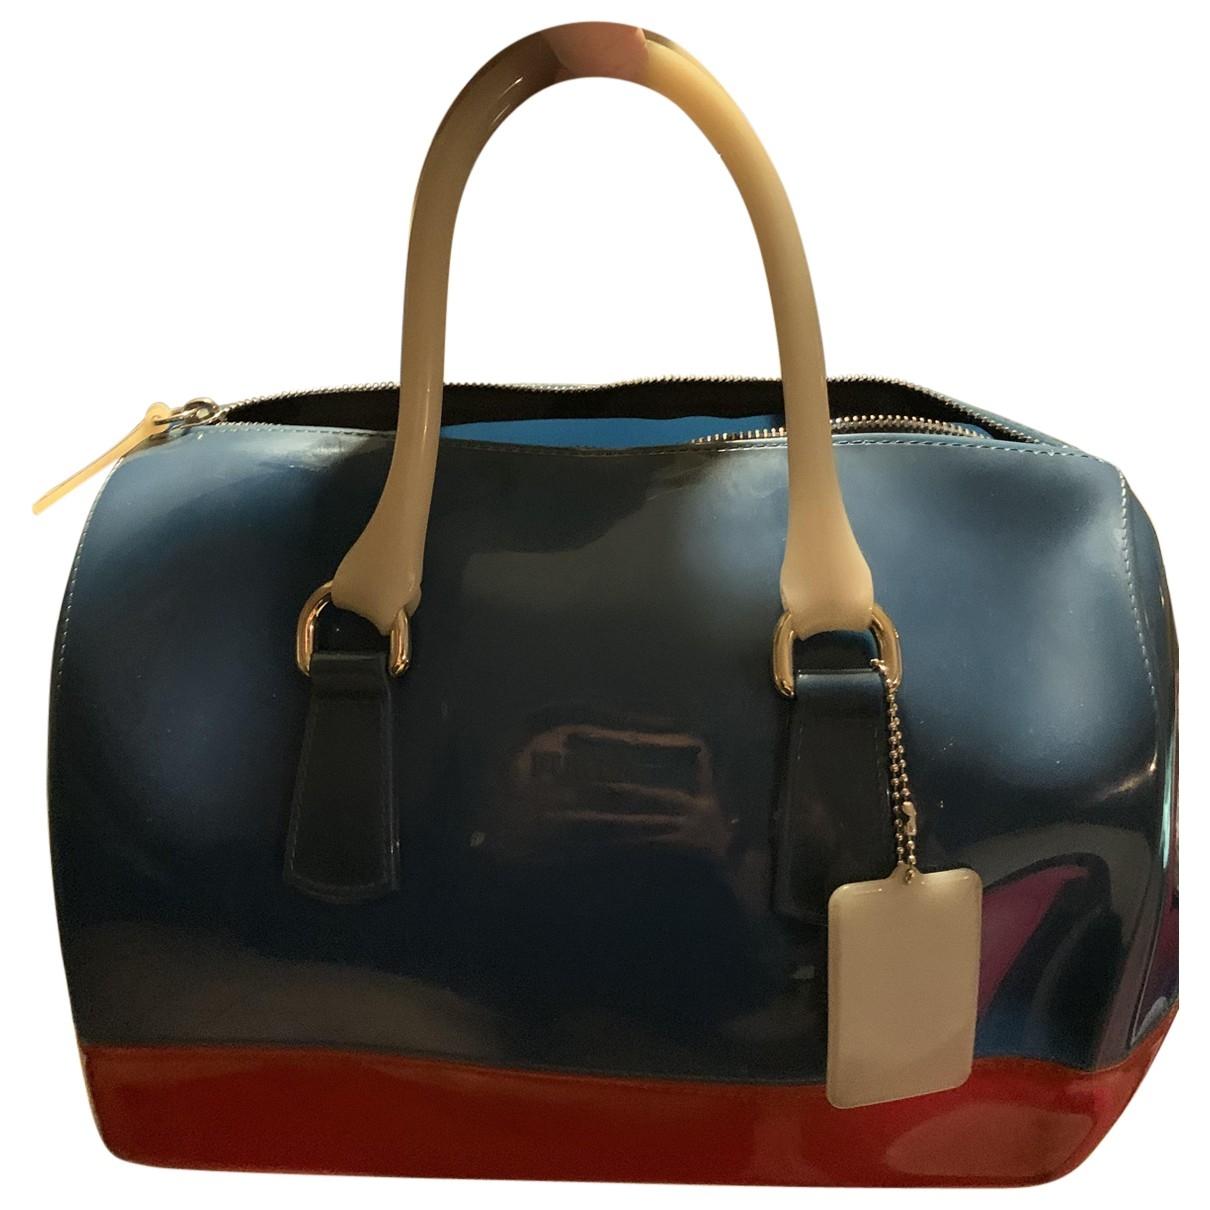 Furla - Sac a main Candy Bag pour femme